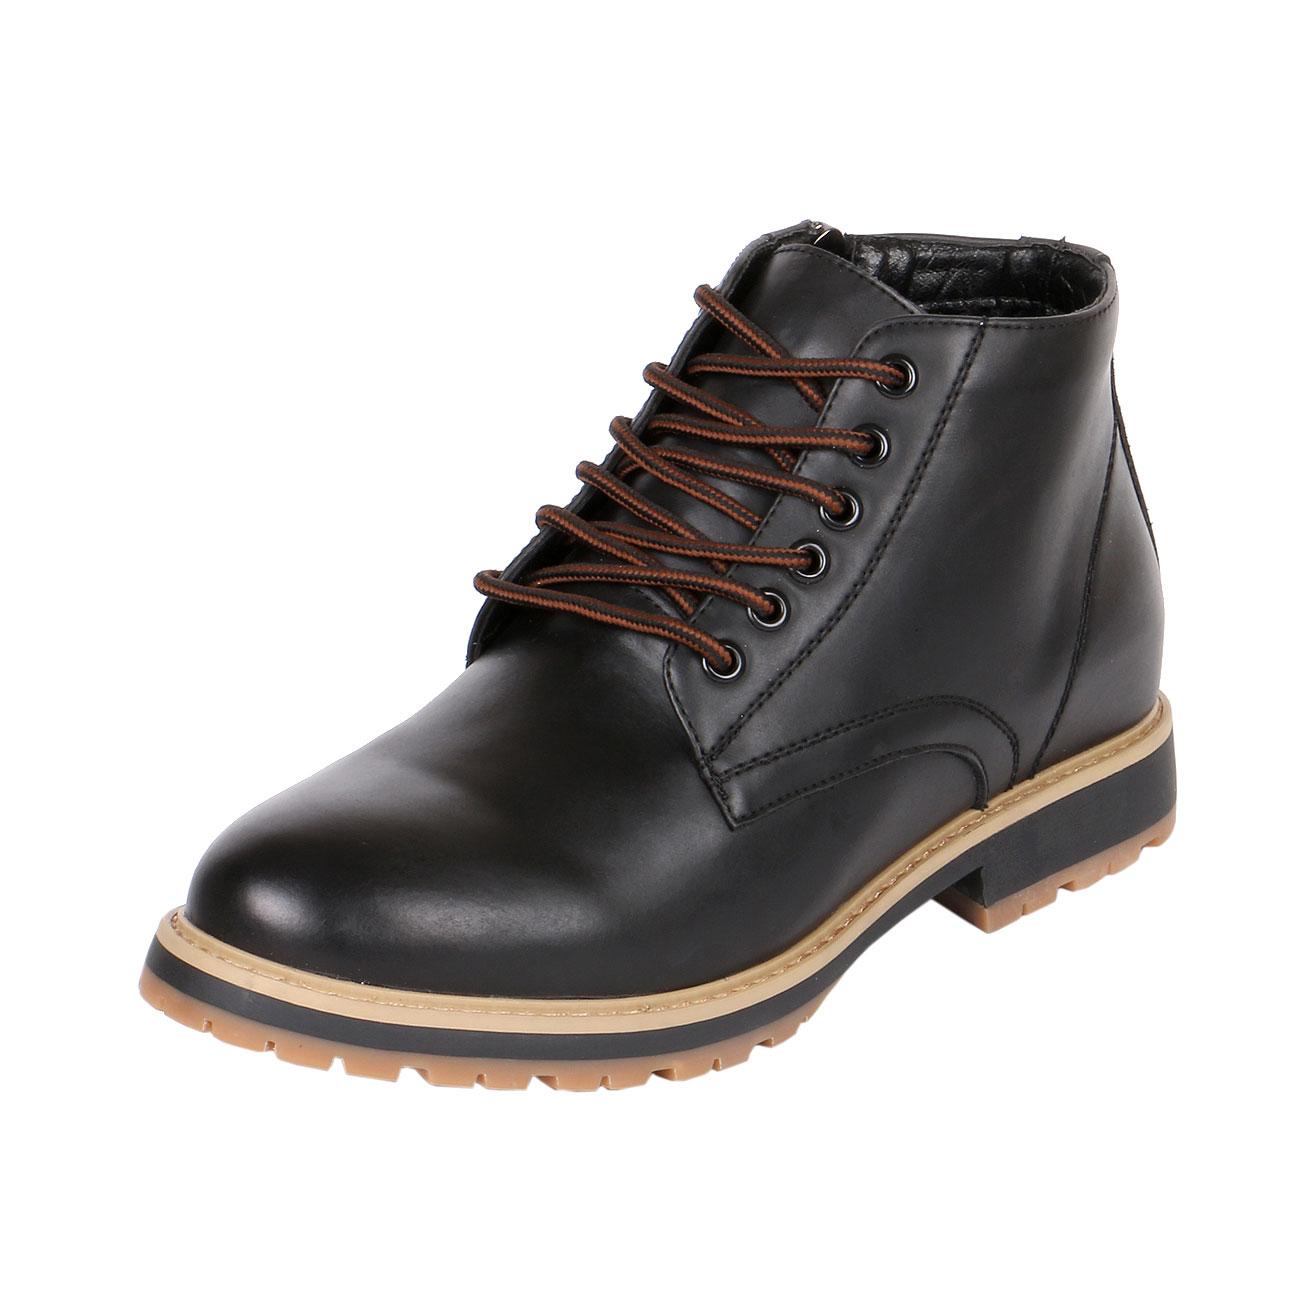 f7448b6cd10 Side Zipper Semi Dress Ankle Boots for Men with Hidden High Heels, TB7005